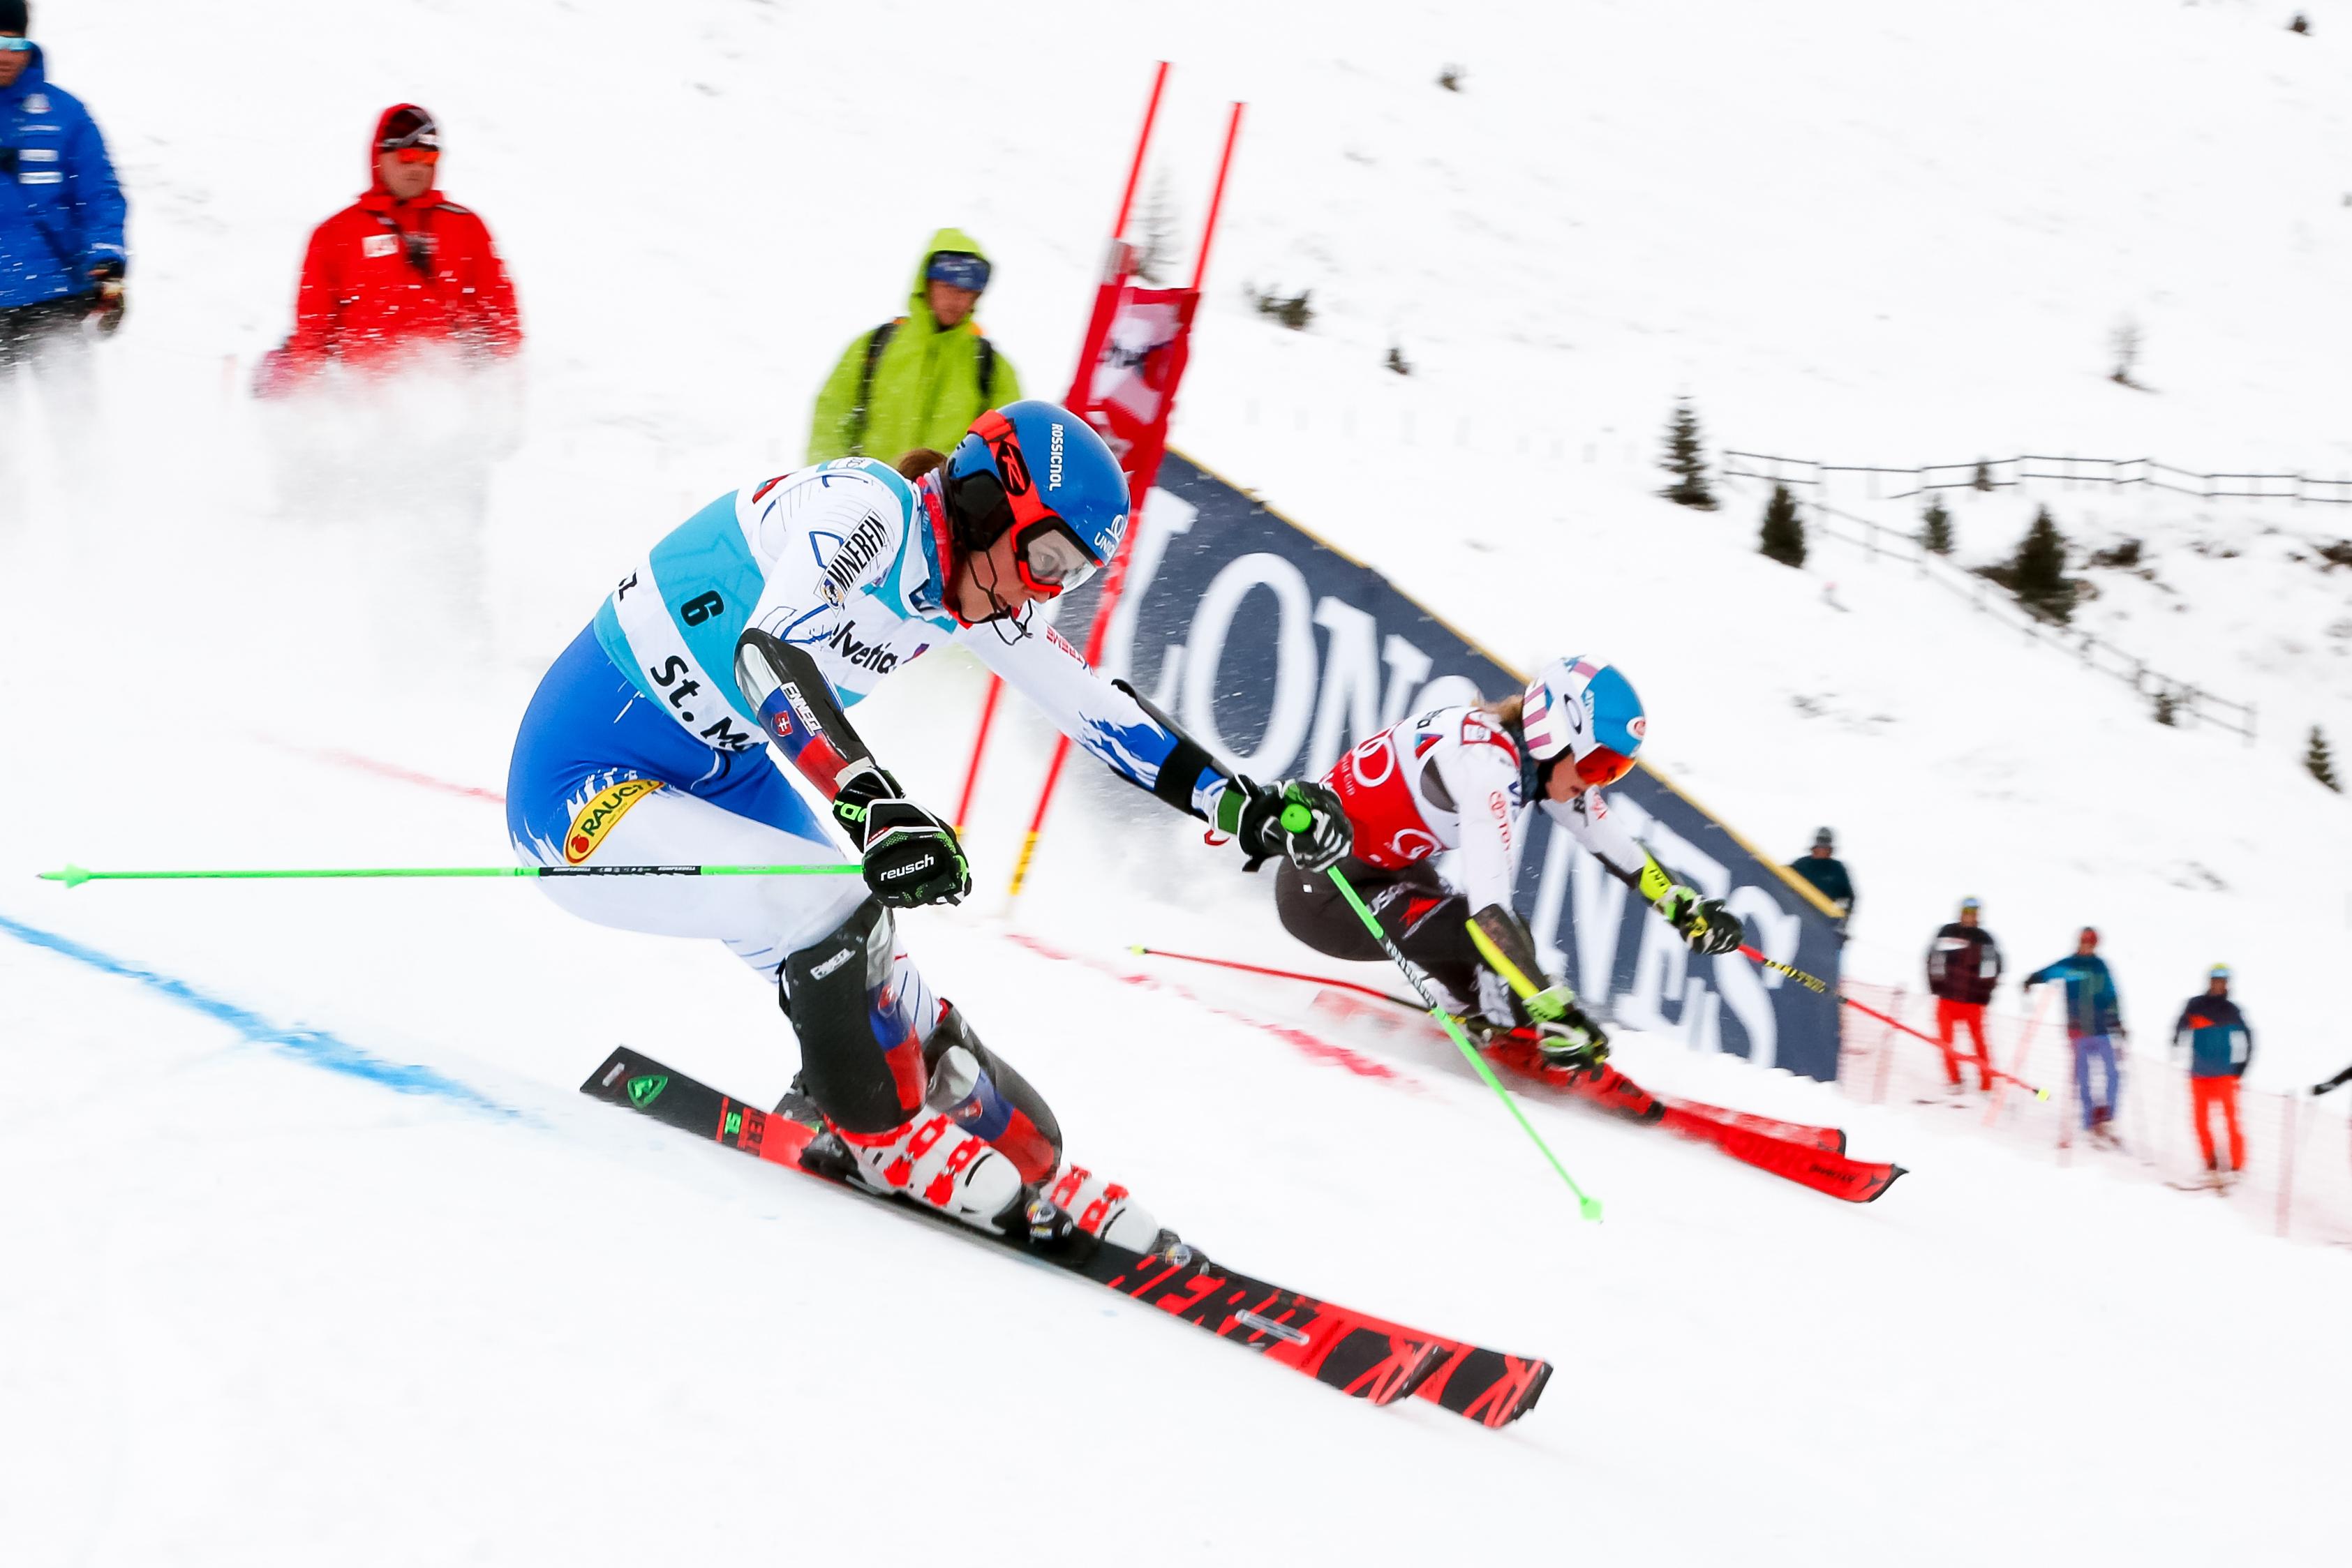 Two skiers racing around slalom gates